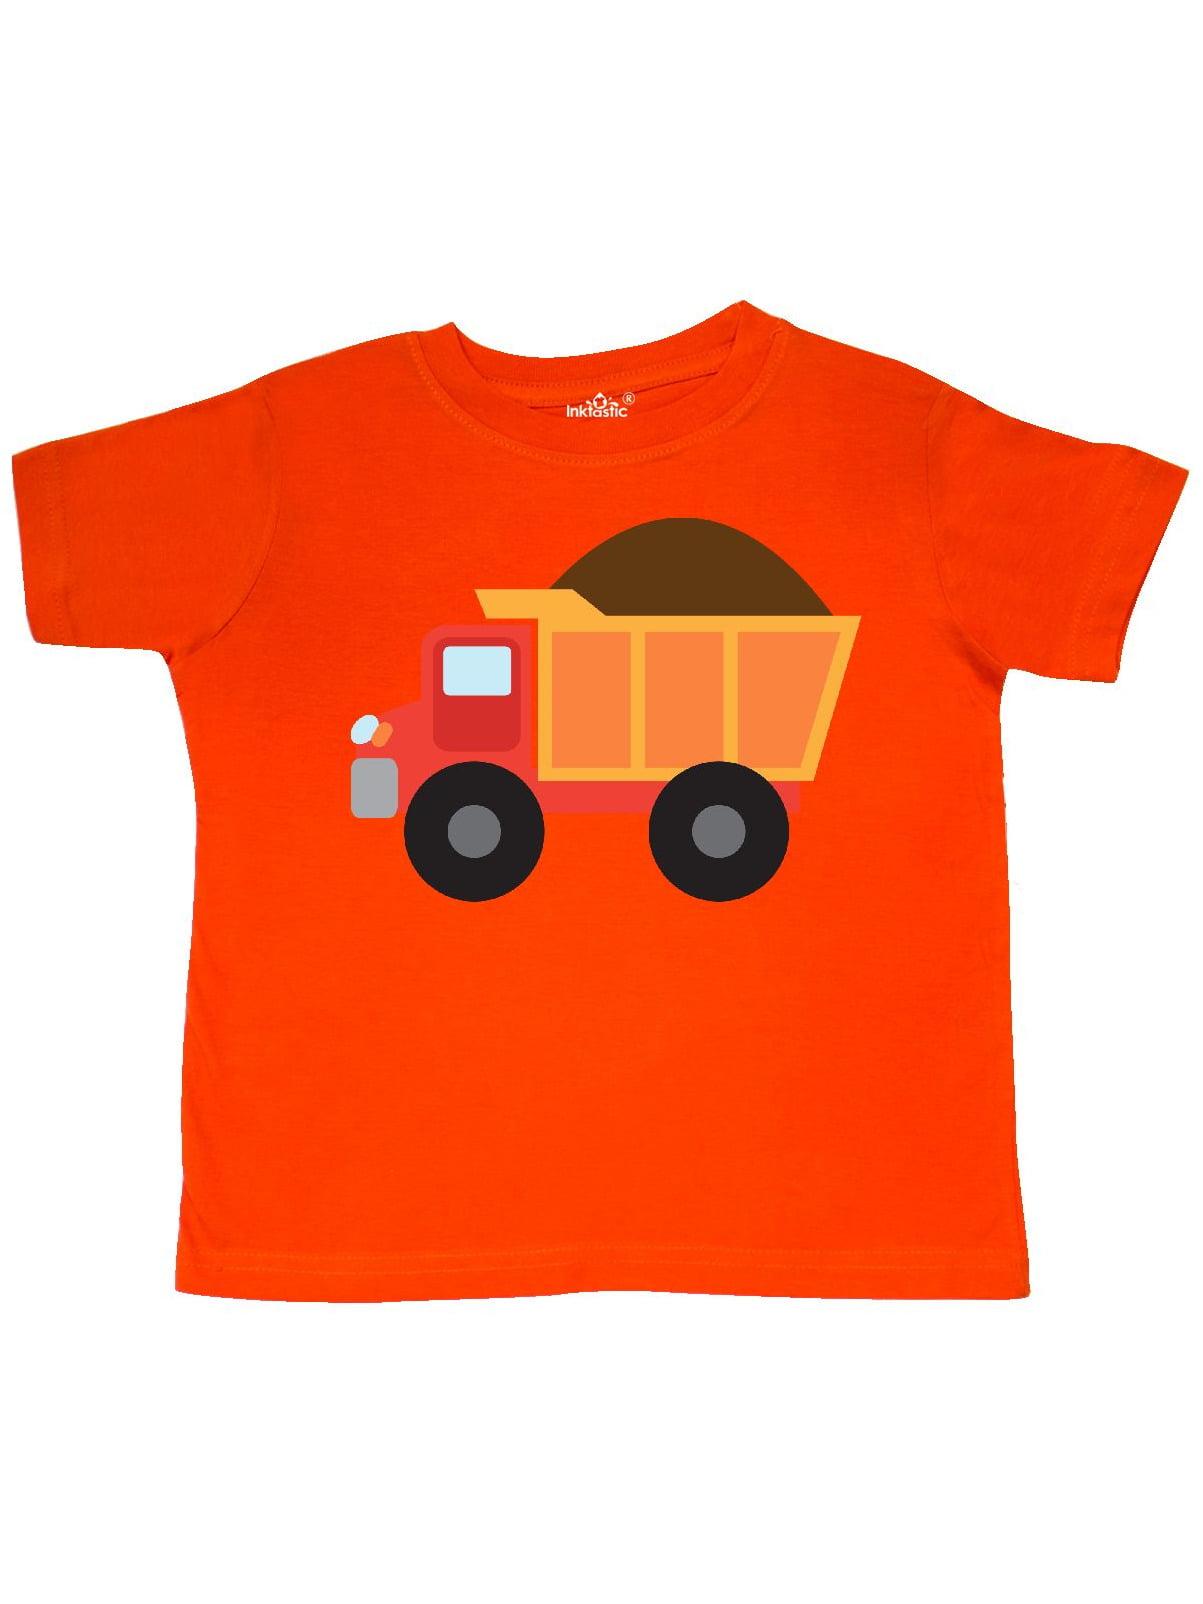 Work Truck Construction Vehicle Toddler T-Shirt